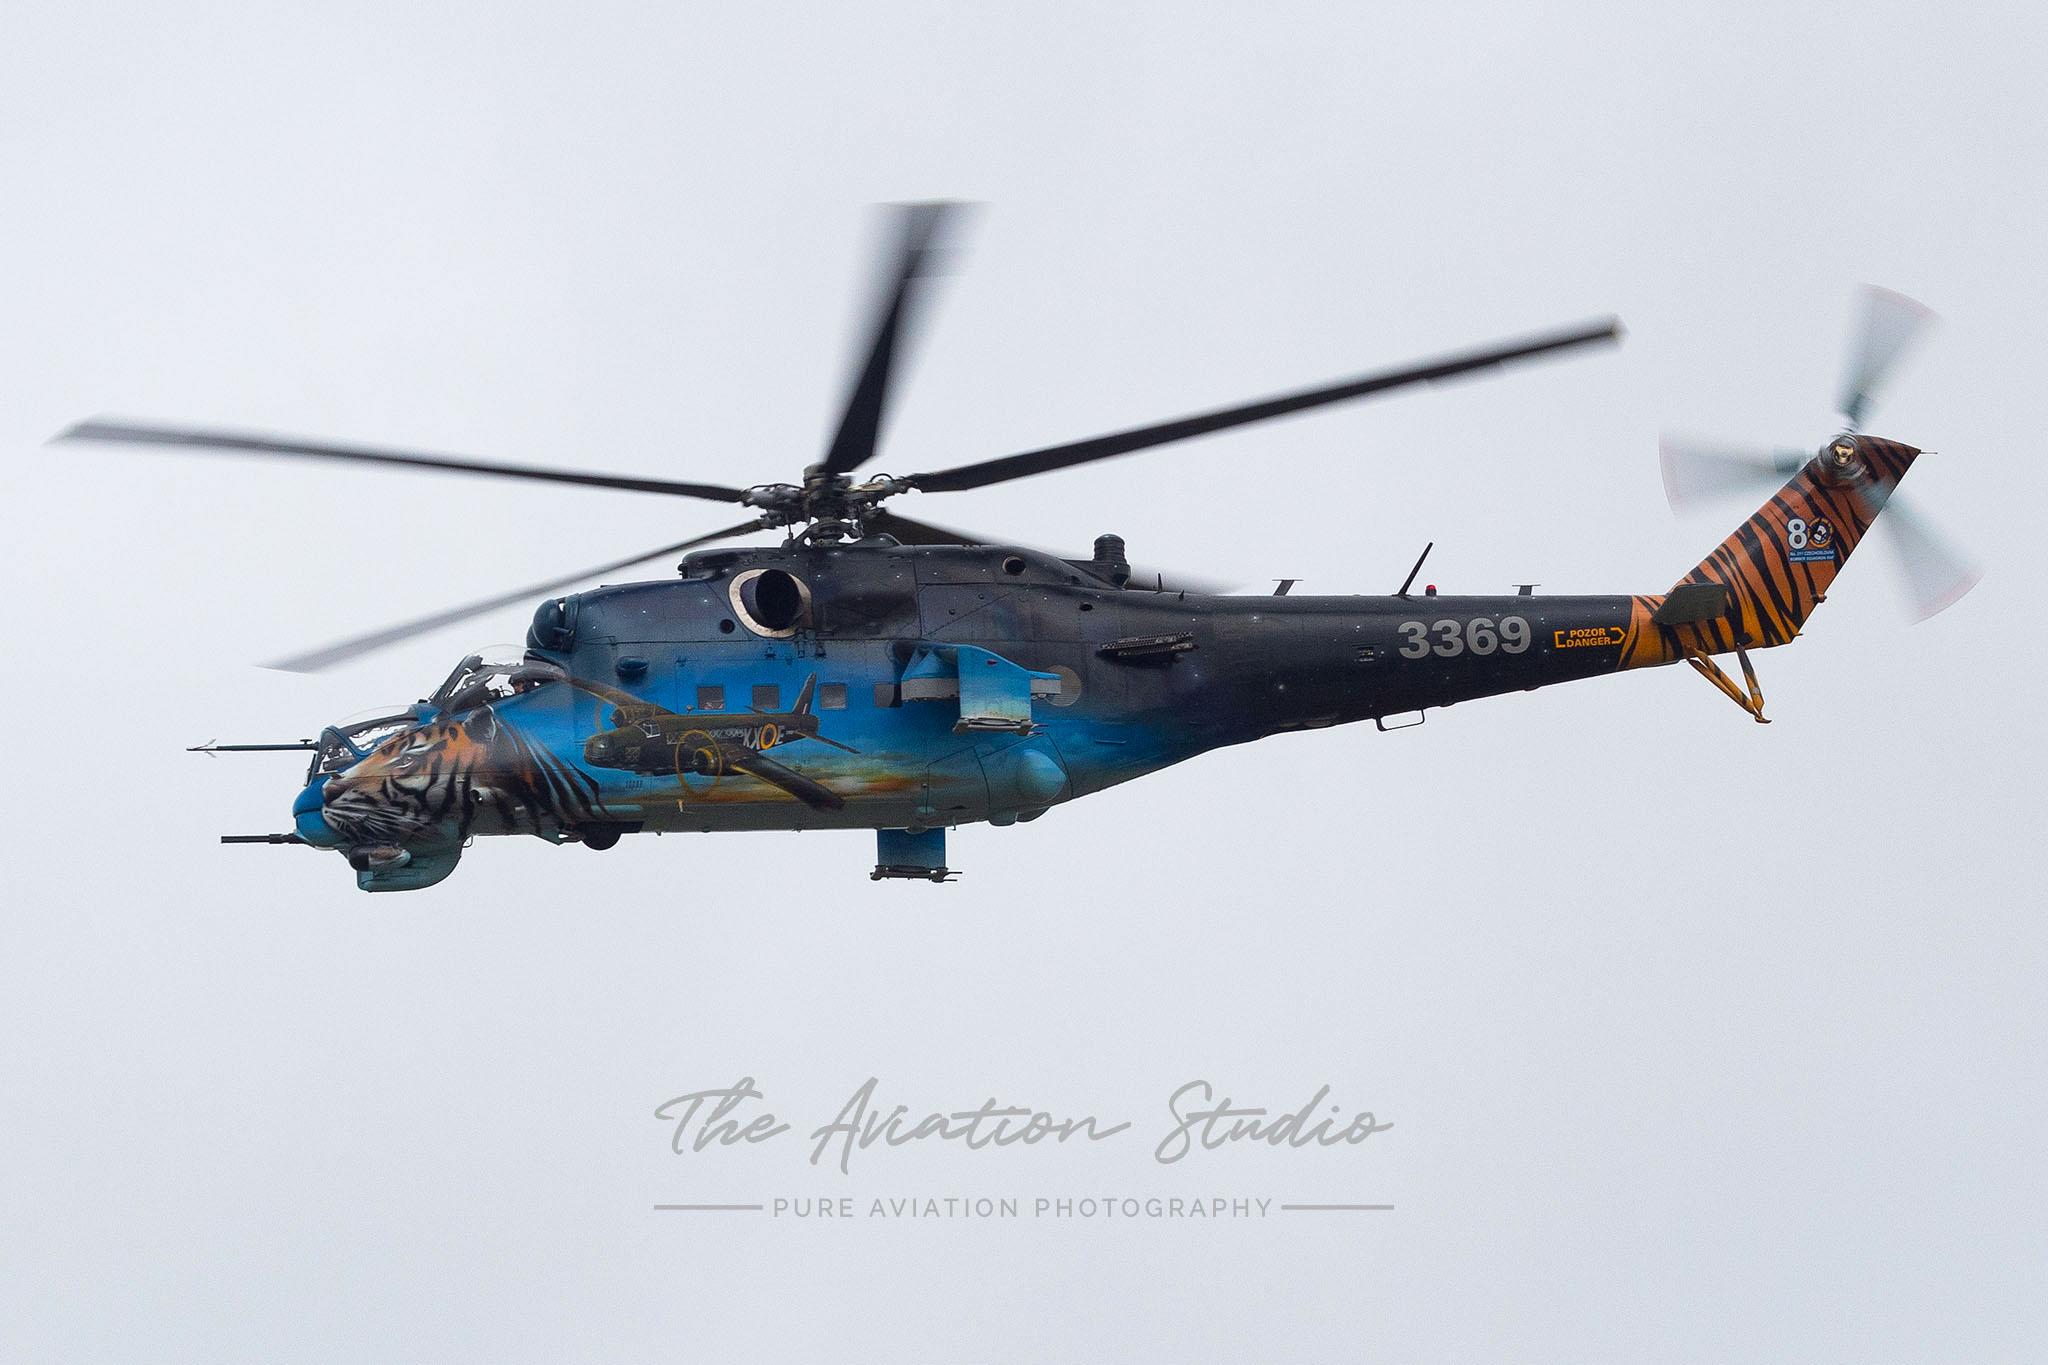 Czech Air Force Mil Mi-35M Hind 3369 at Spottersday Kleine Brogel 2021